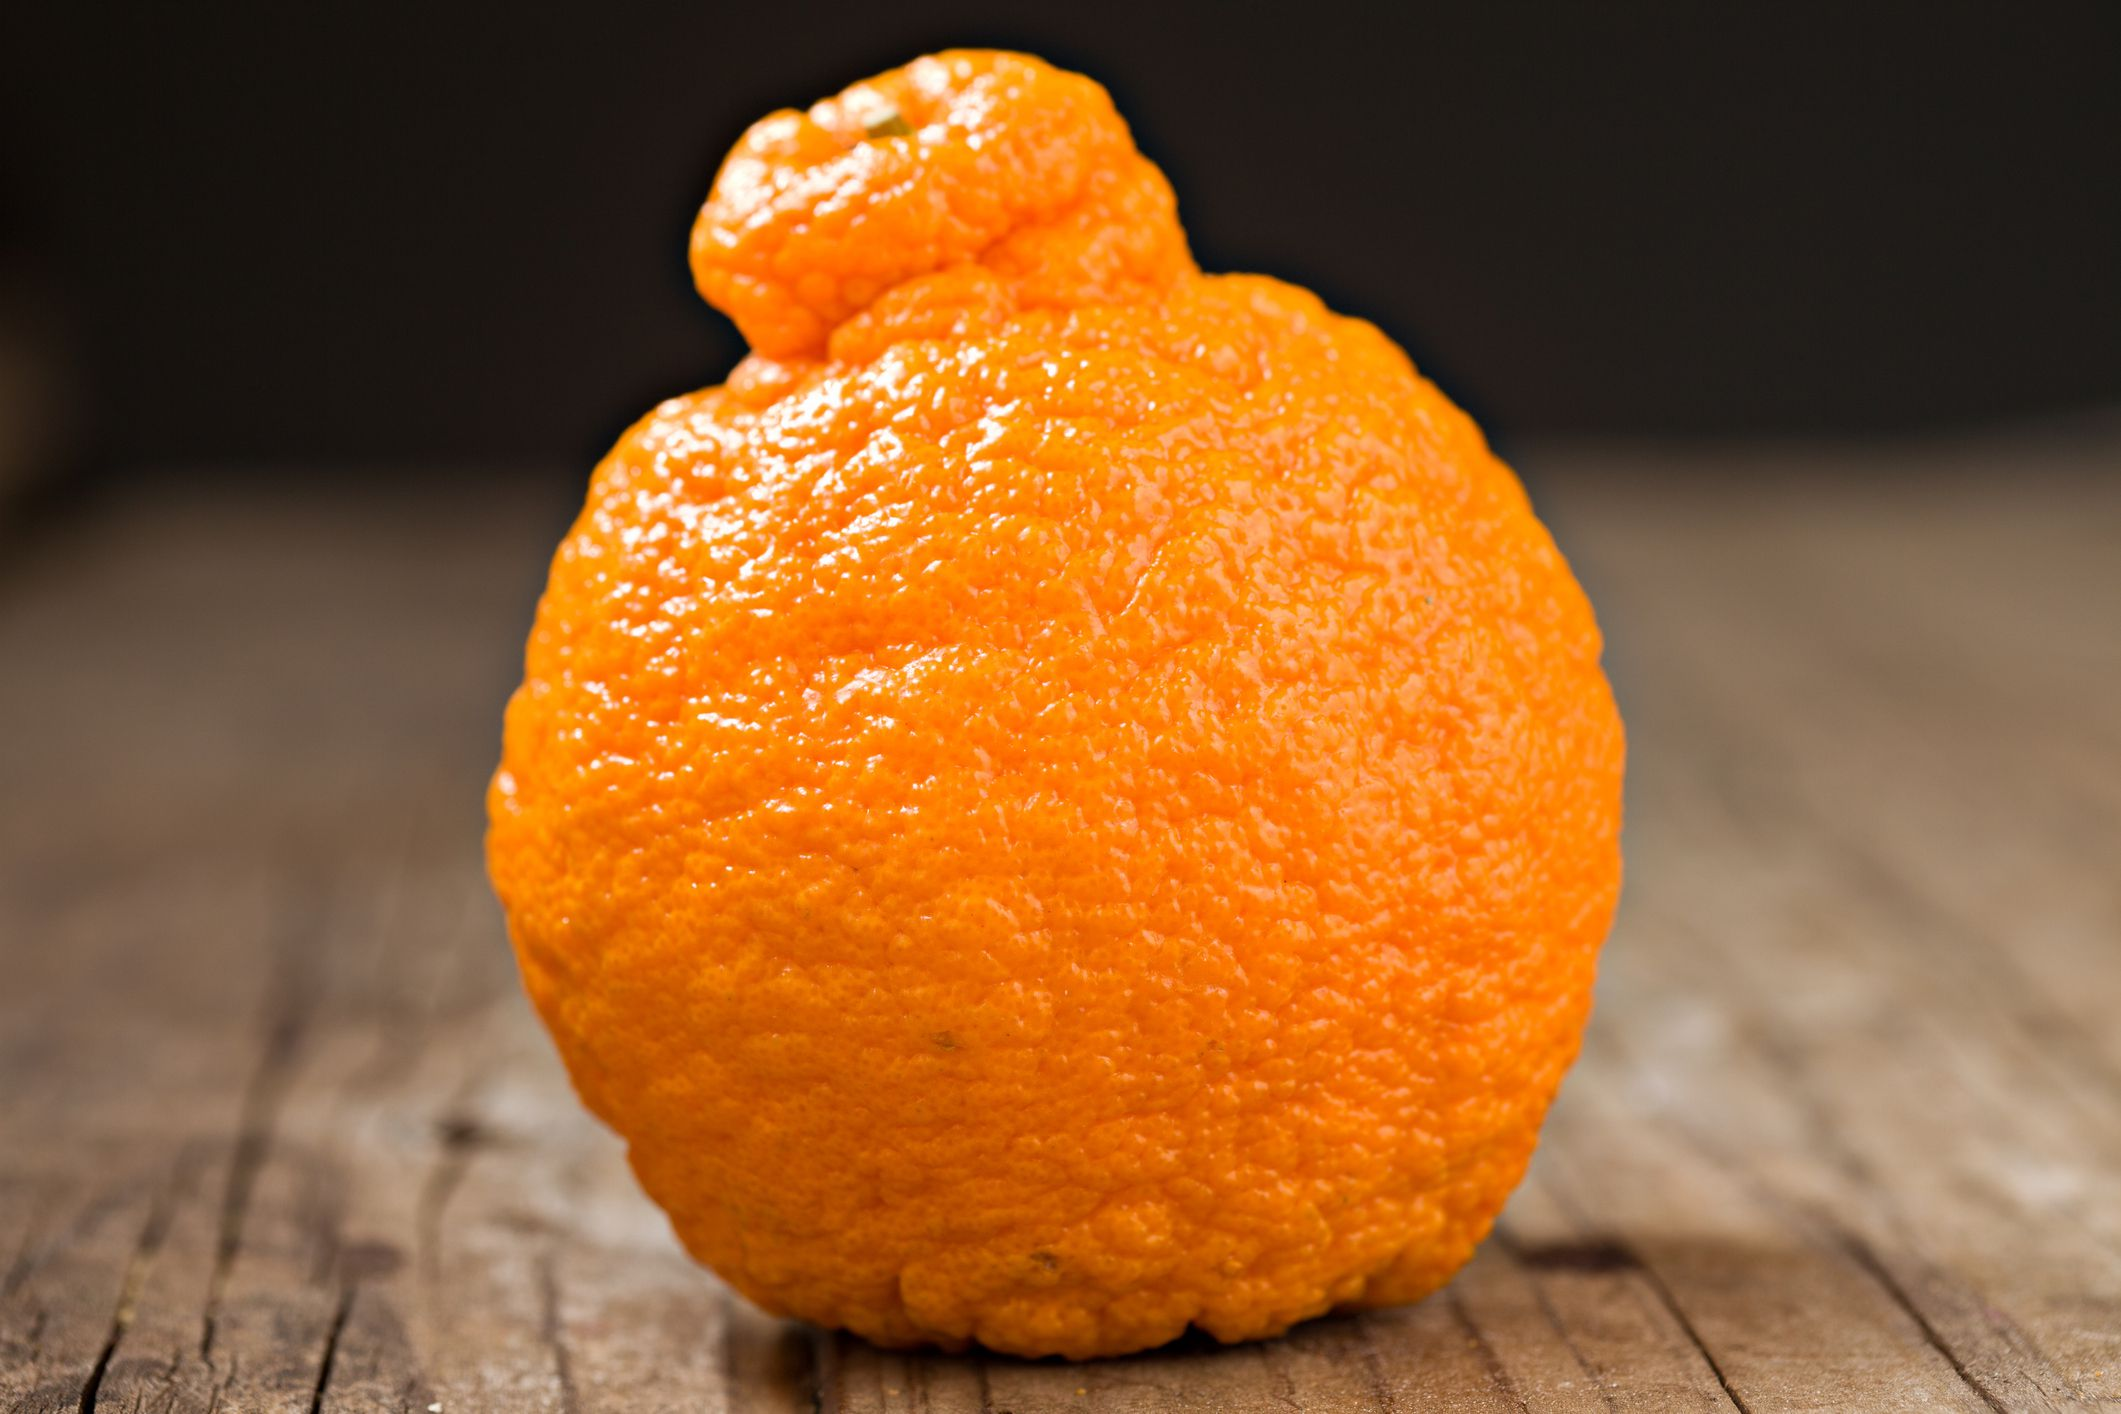 sumo-orange-royalty-free-image-172313714-1553784545.jpg